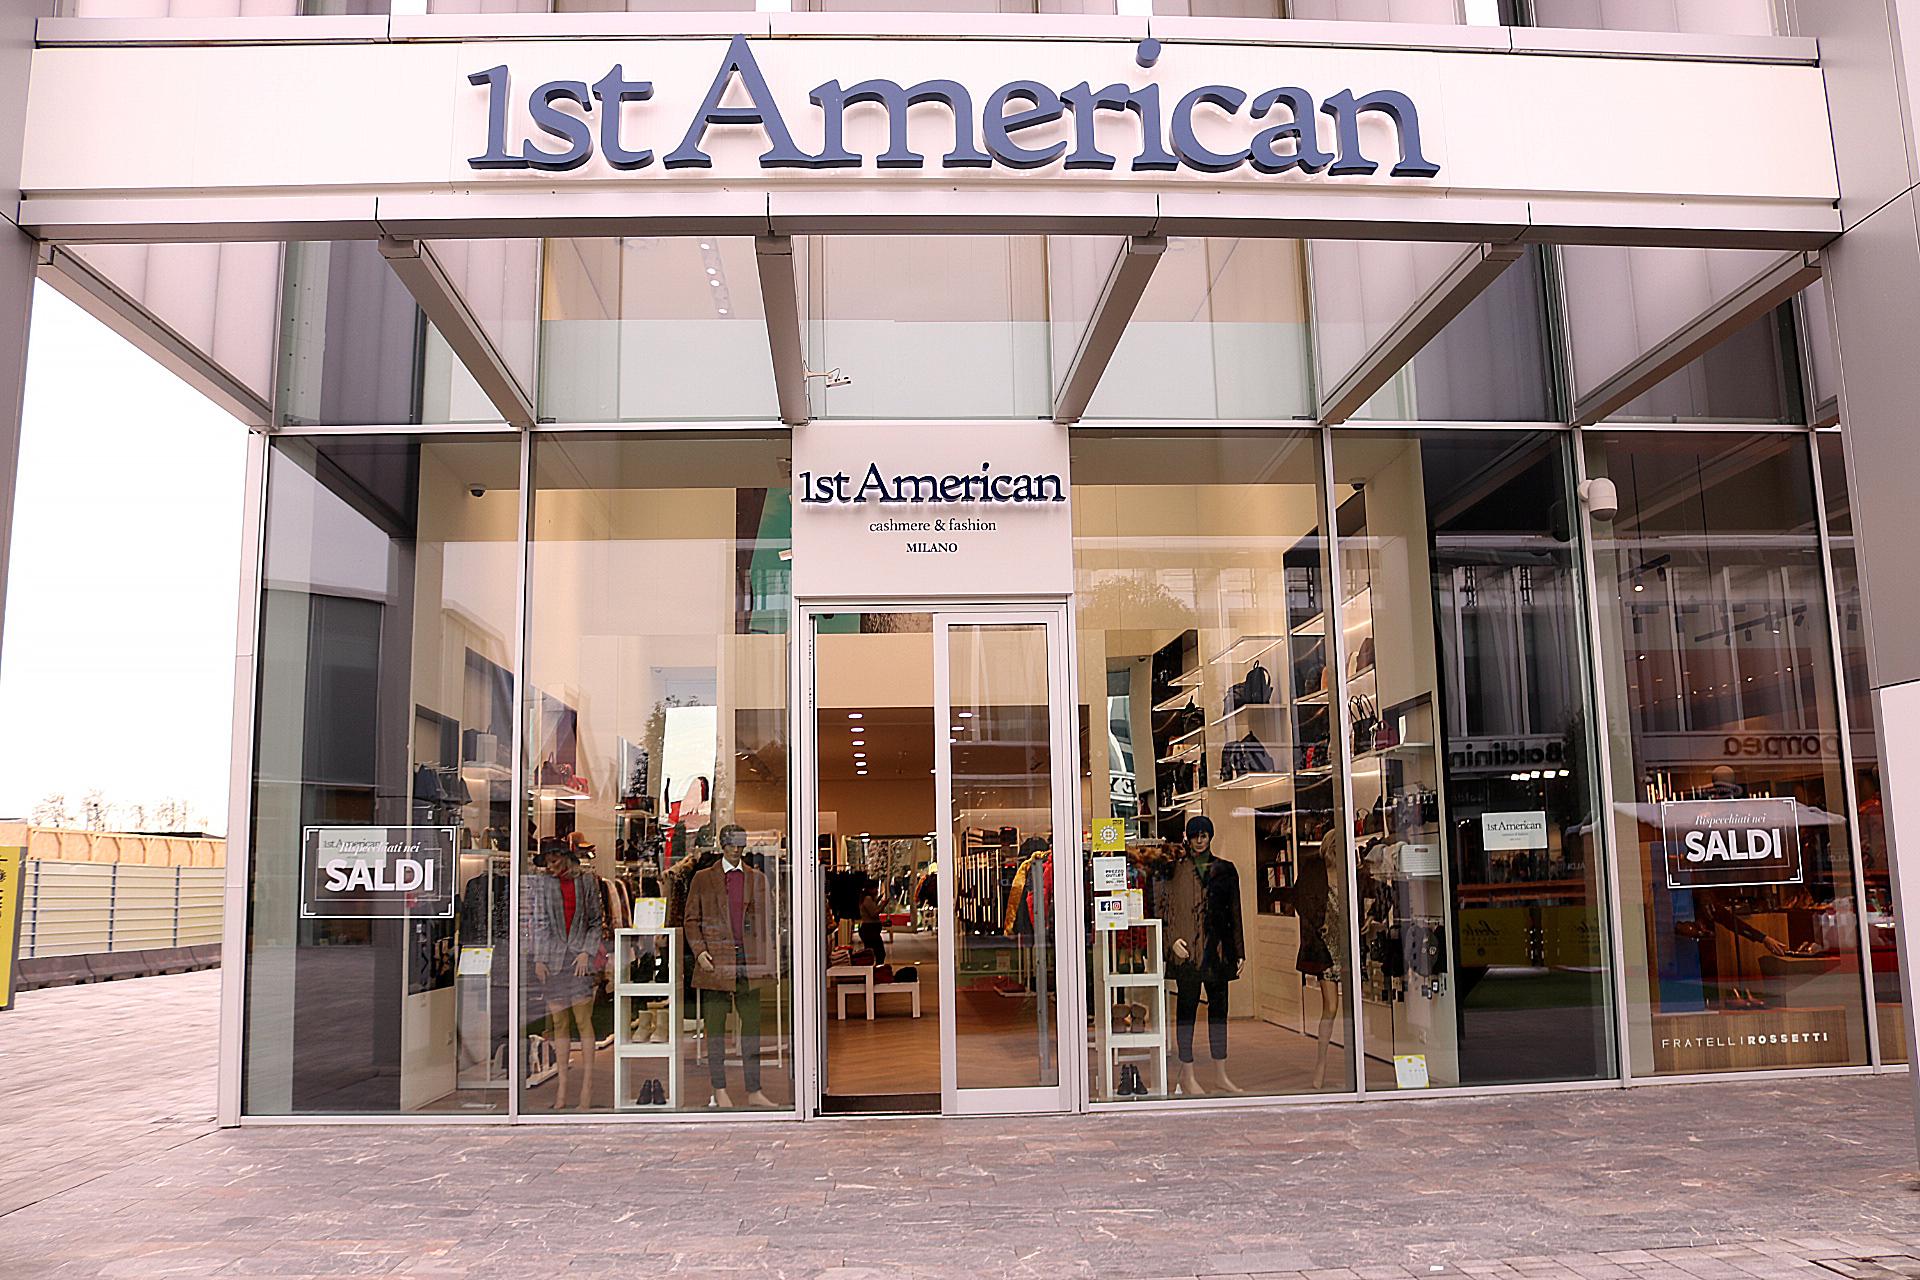 1stAmerican local store 6